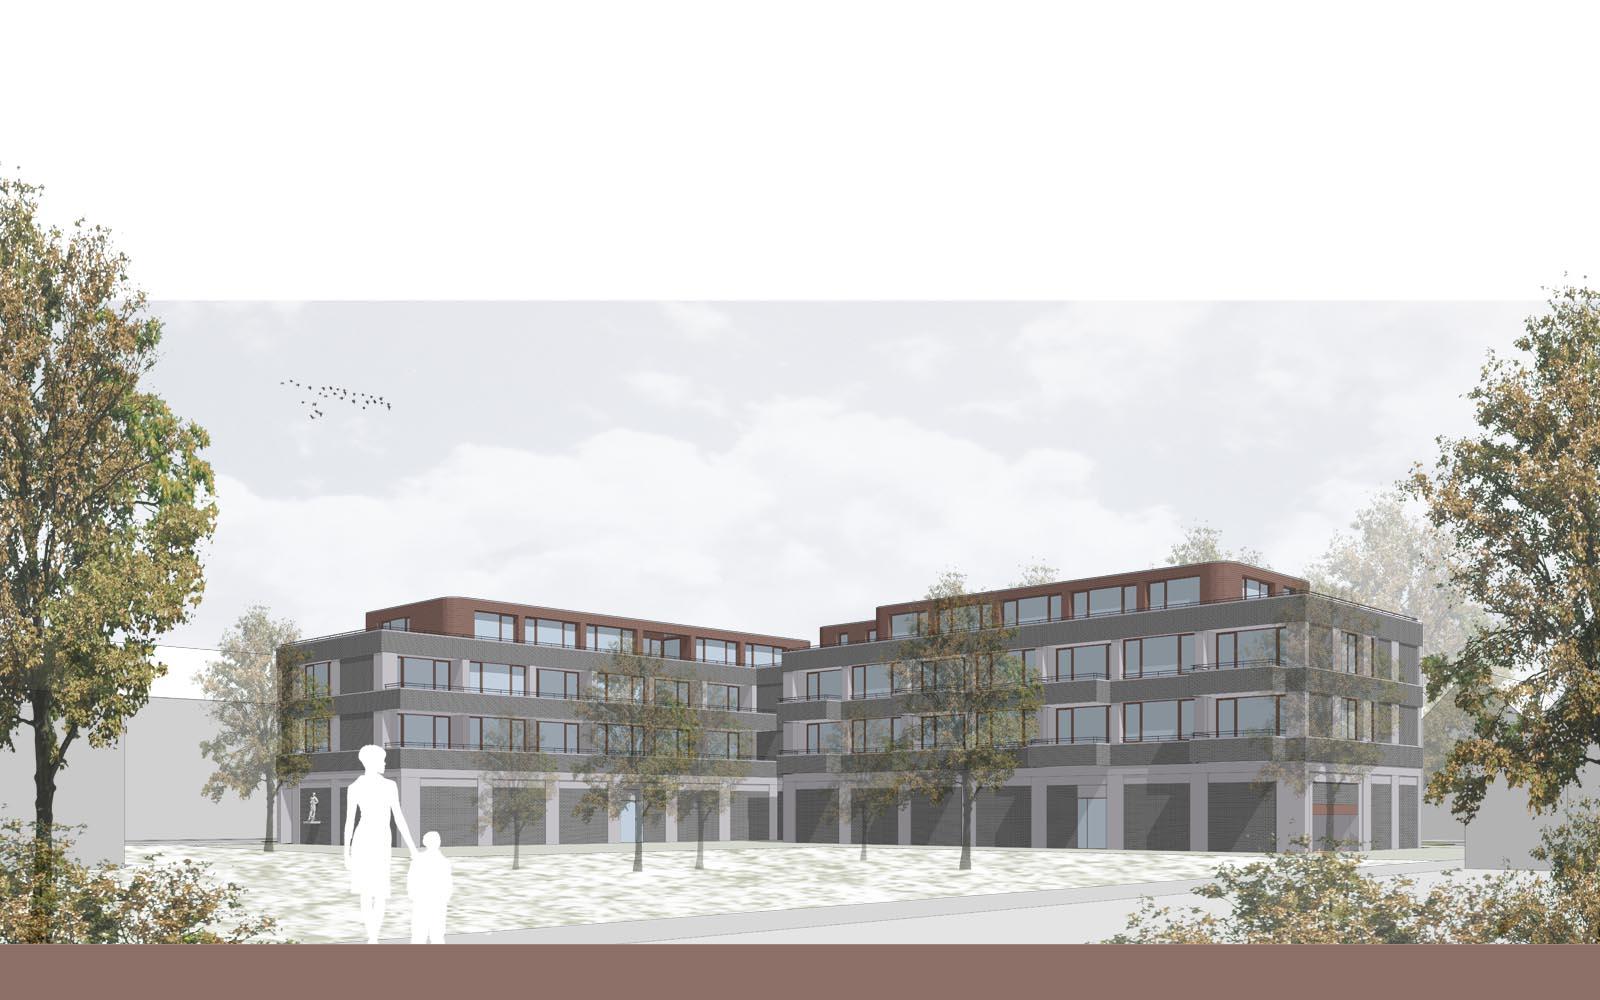 WBW_Meerbusch_SteinwegClausArchitekten_Mehrfamilienhaus_Geschäftshaus_Arkadengang_Staffelgeschoss_00007